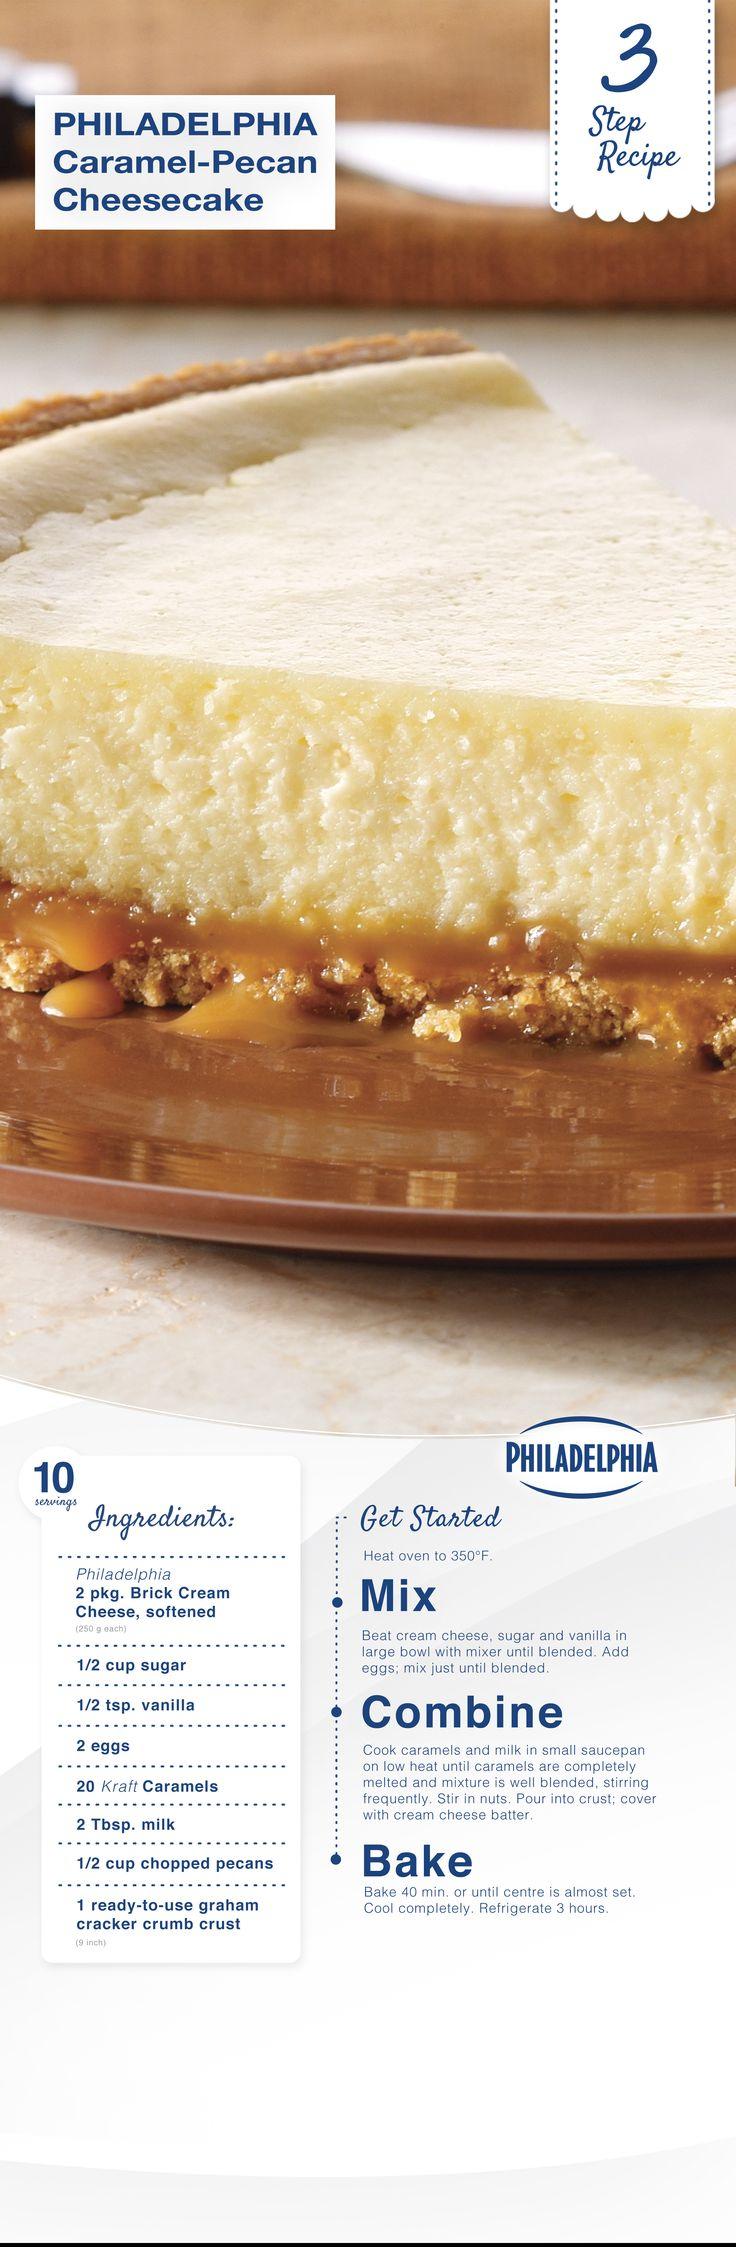 PHILADELPHIA 3-STEP Caramel-Pecan Cheesecake with Philly cream cheese